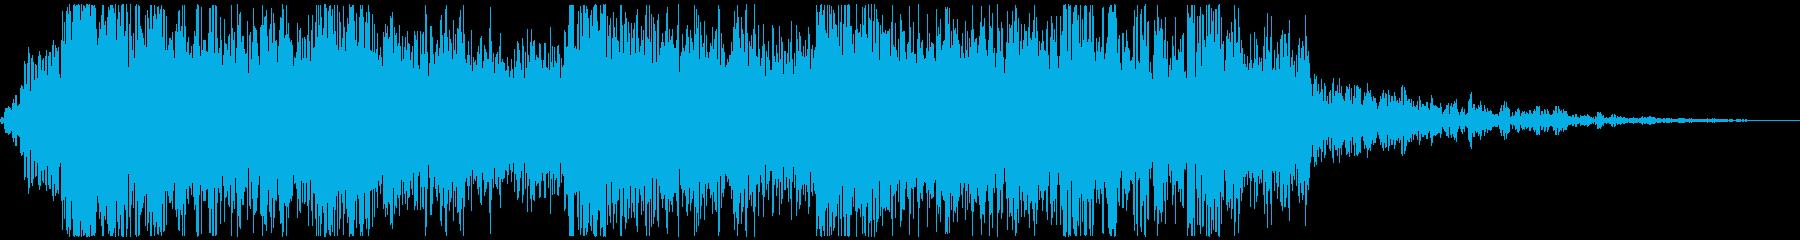 Powerful Rock Logo's reproduced waveform